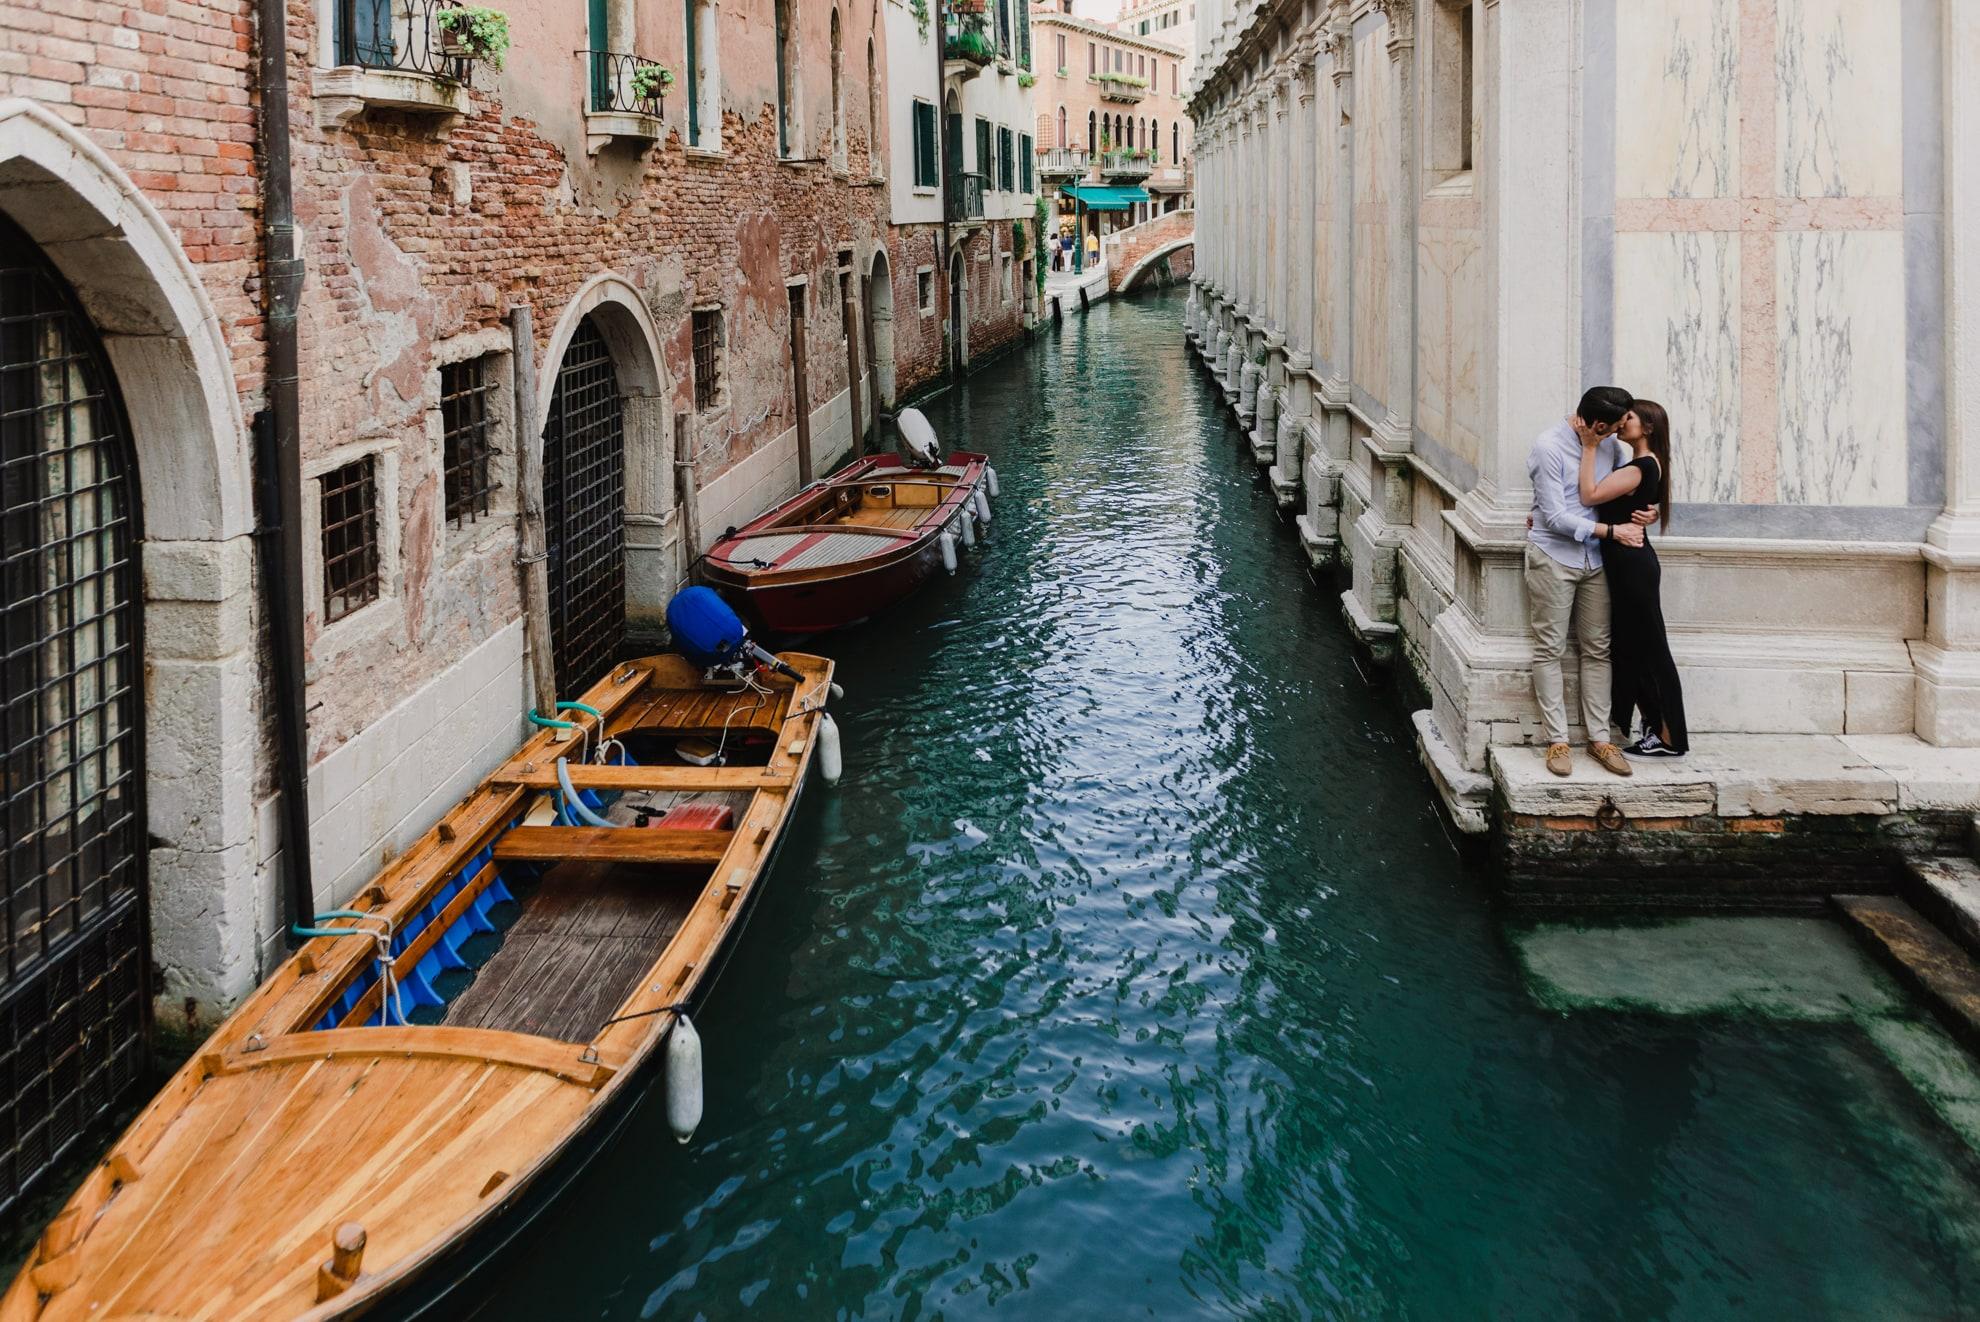 engagement venice venezia proposal proposta matrimonio fidanzamento irene pollacchi fotografa 13